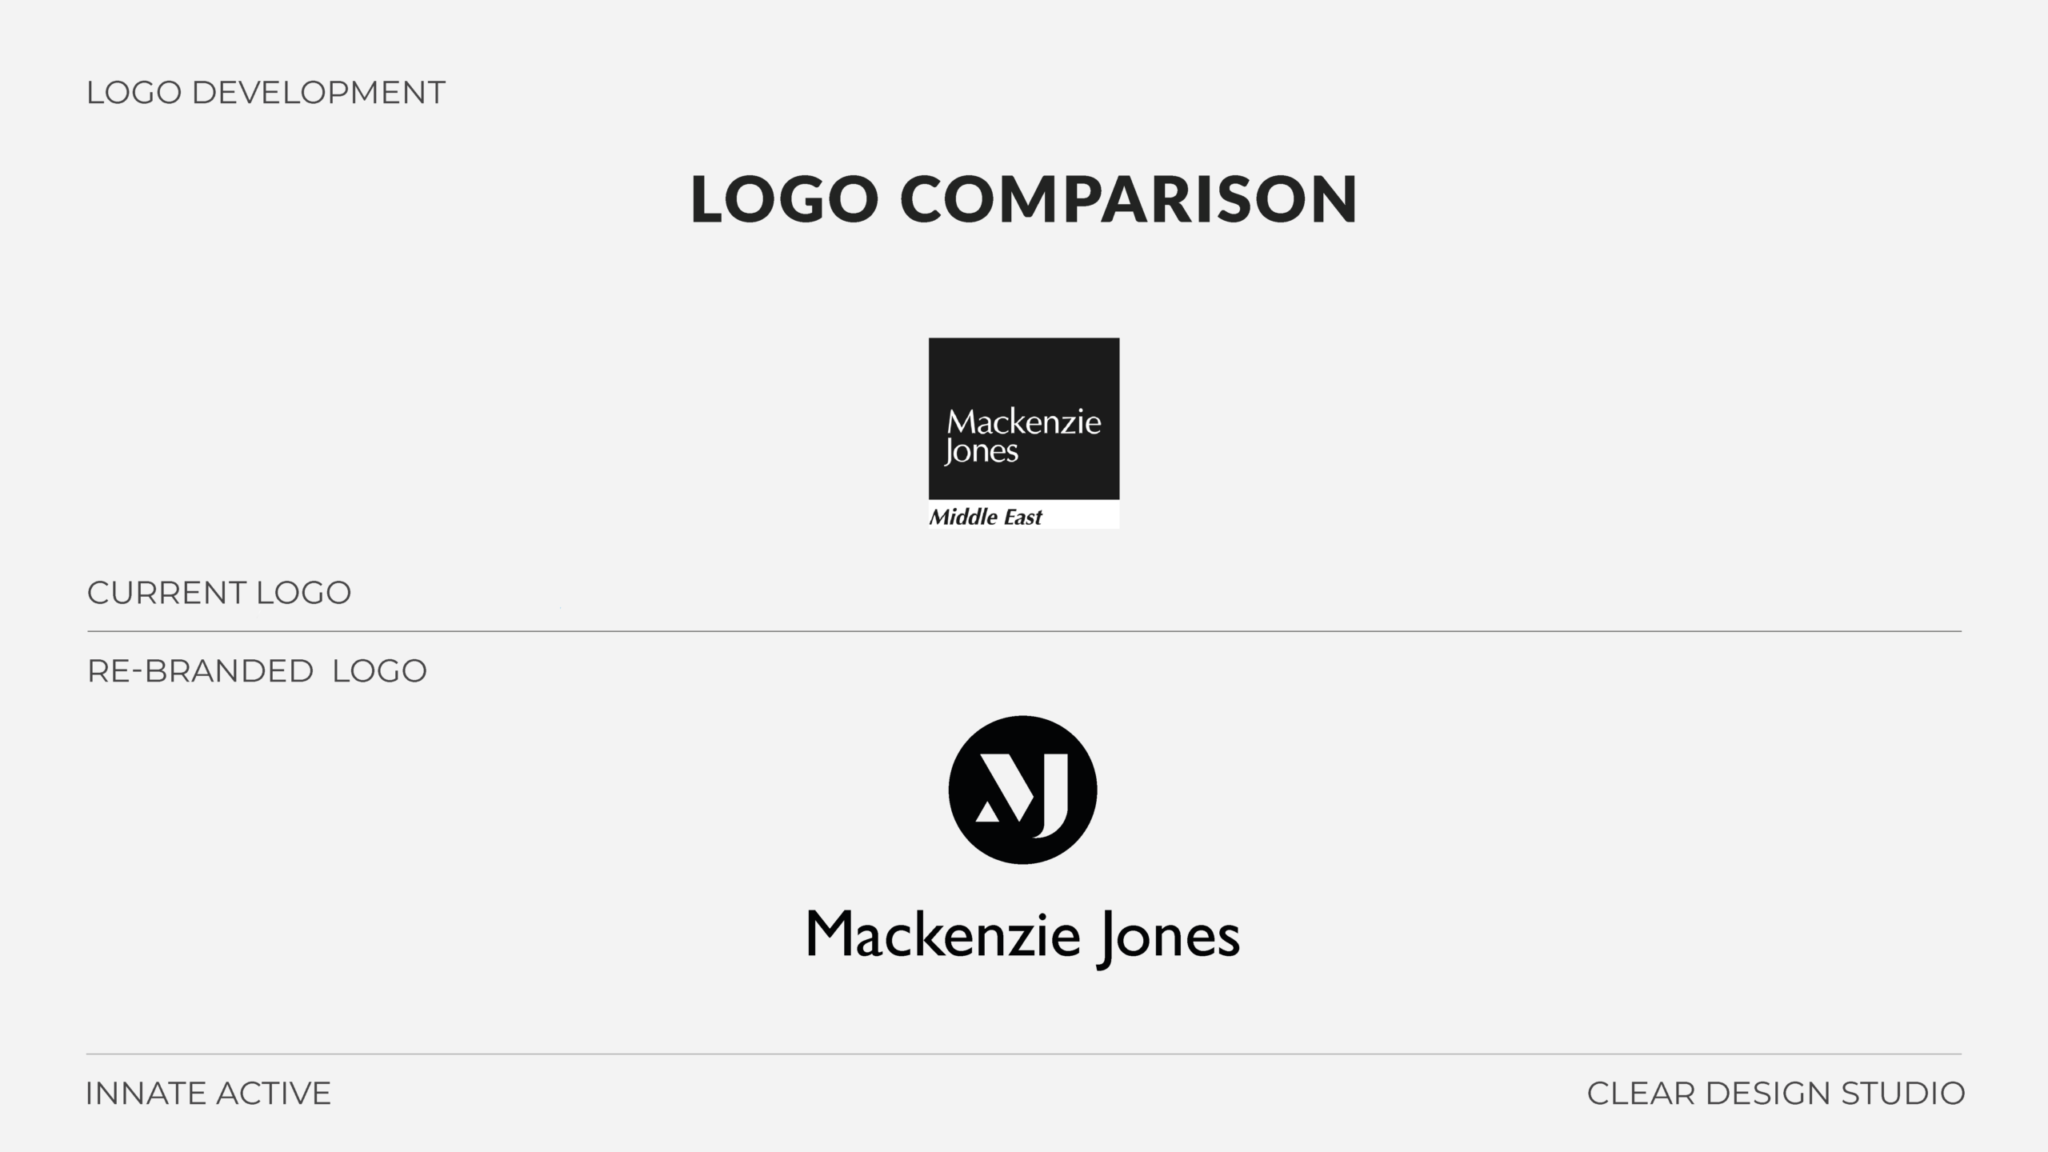 Mackenzie Jones Logo Design Presentation 2